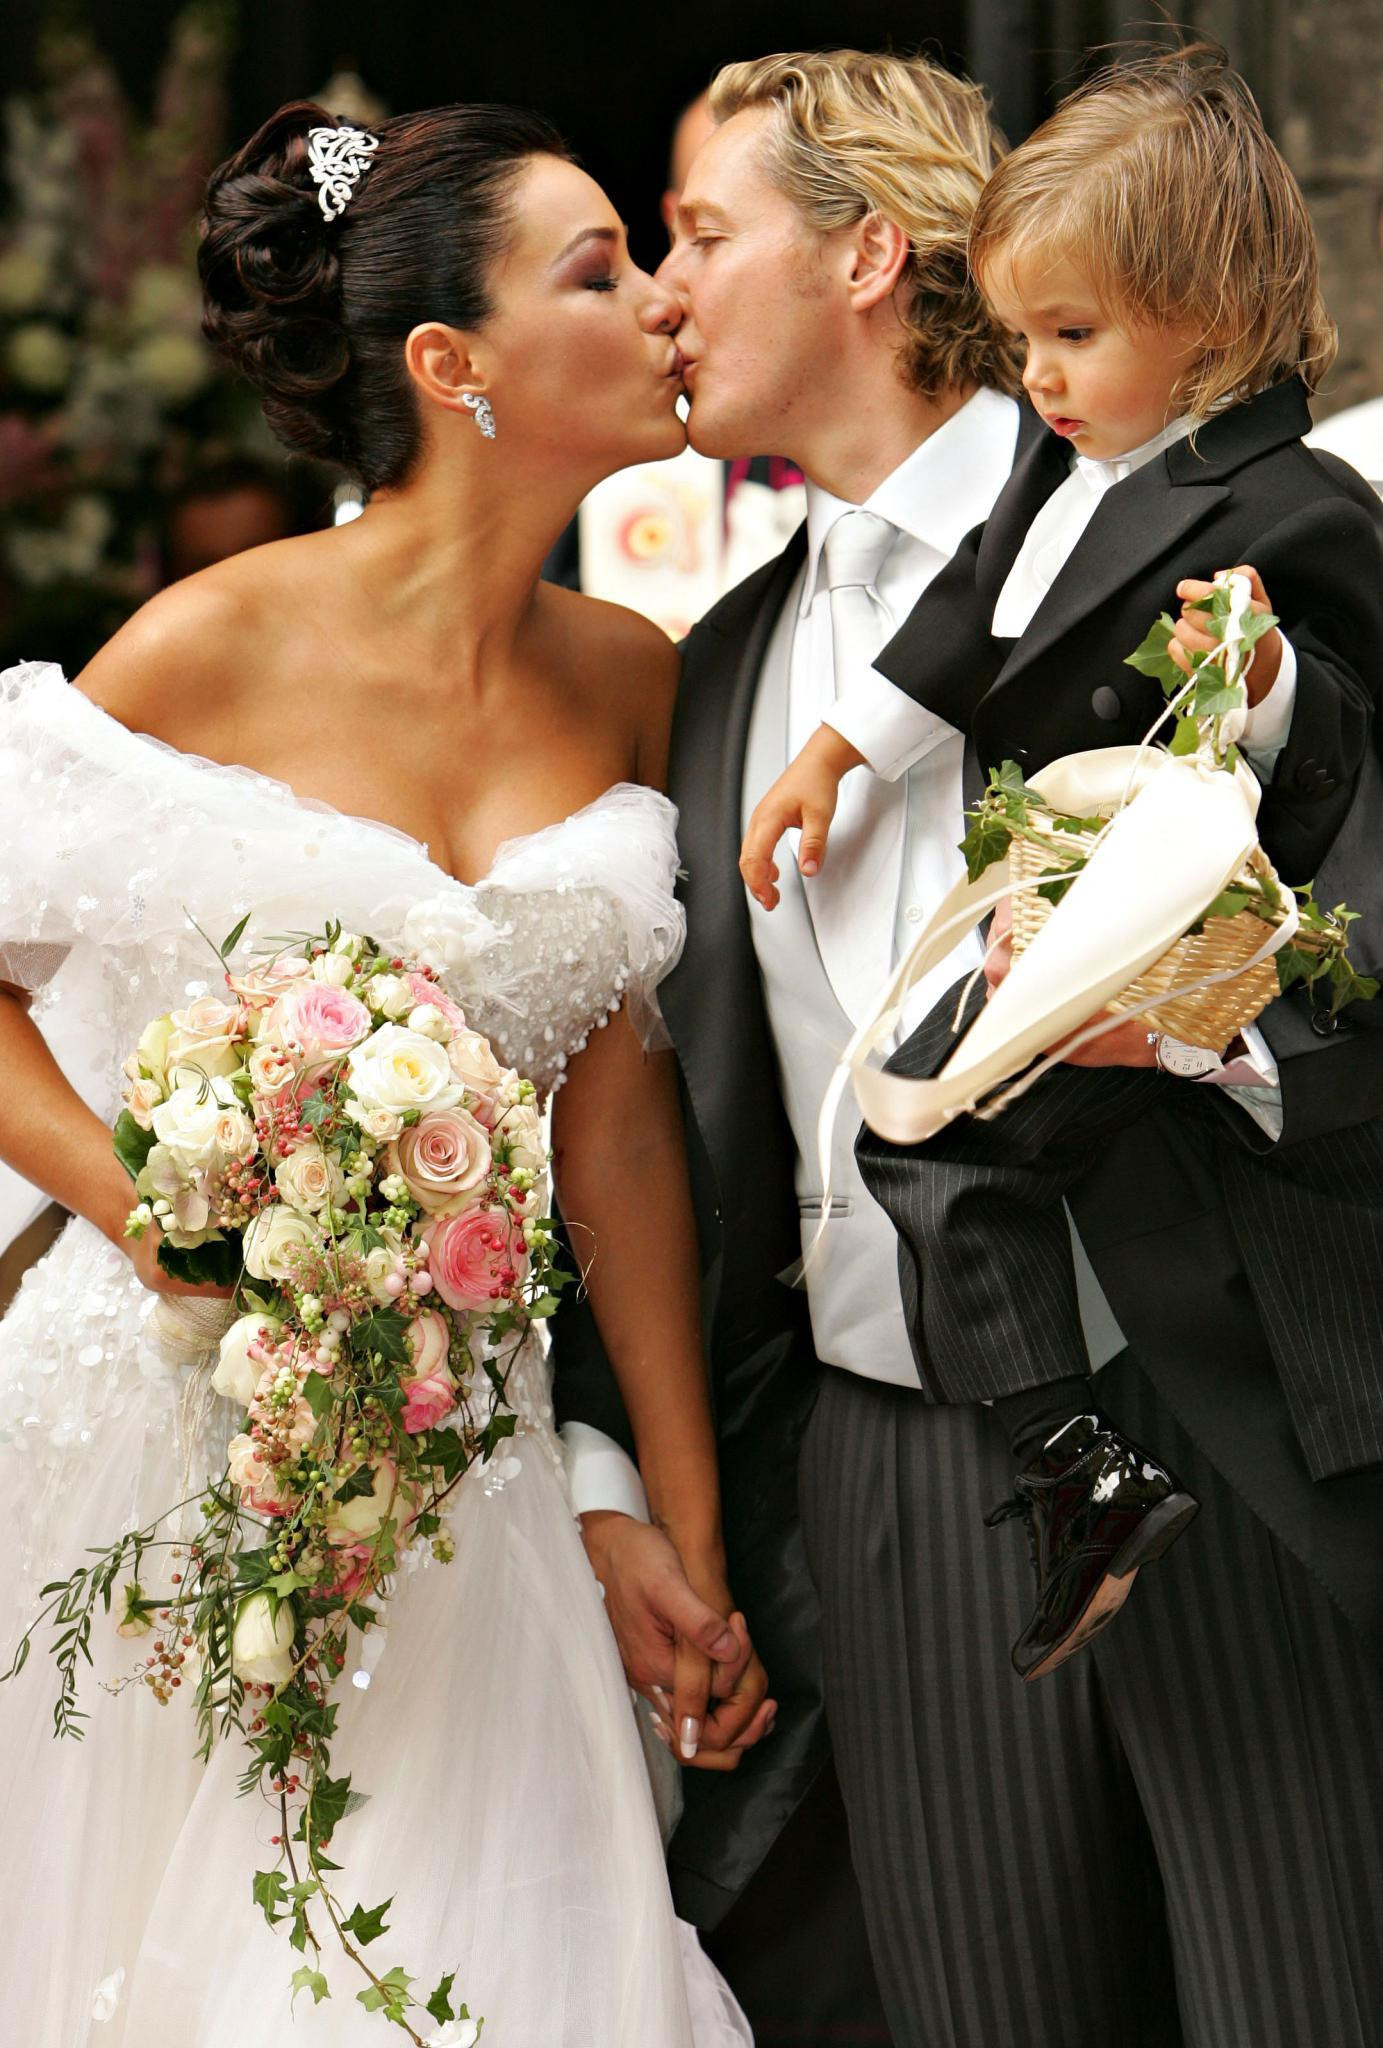 Verona Pooth Hochzeitskleid  Prominente Jasager Nazan Eckes Verona Pooth Co lassen